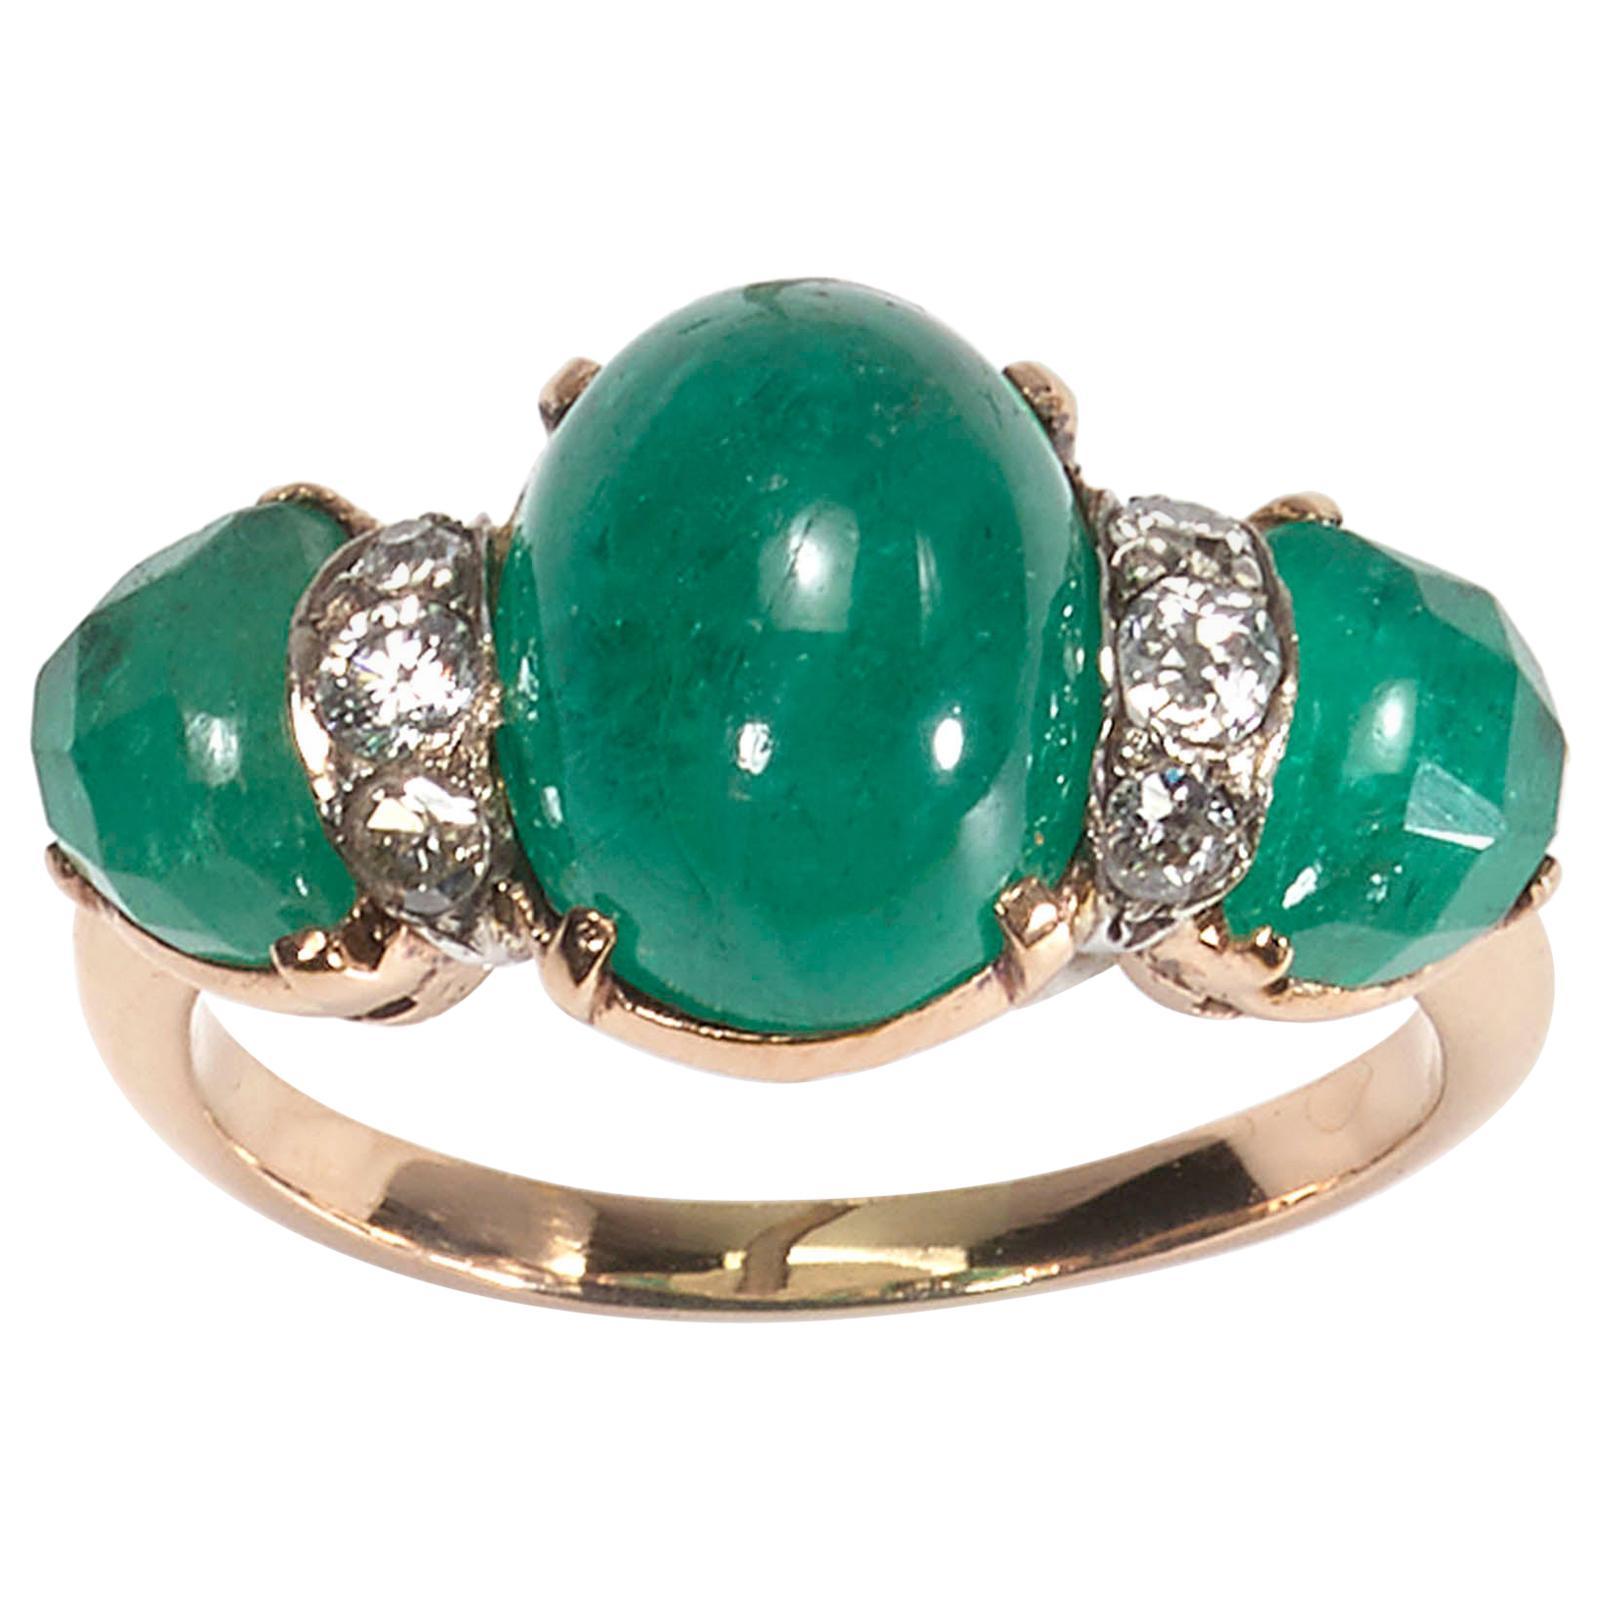 Vintage Cabochon Emerald and Diamond Three-Stone Ring